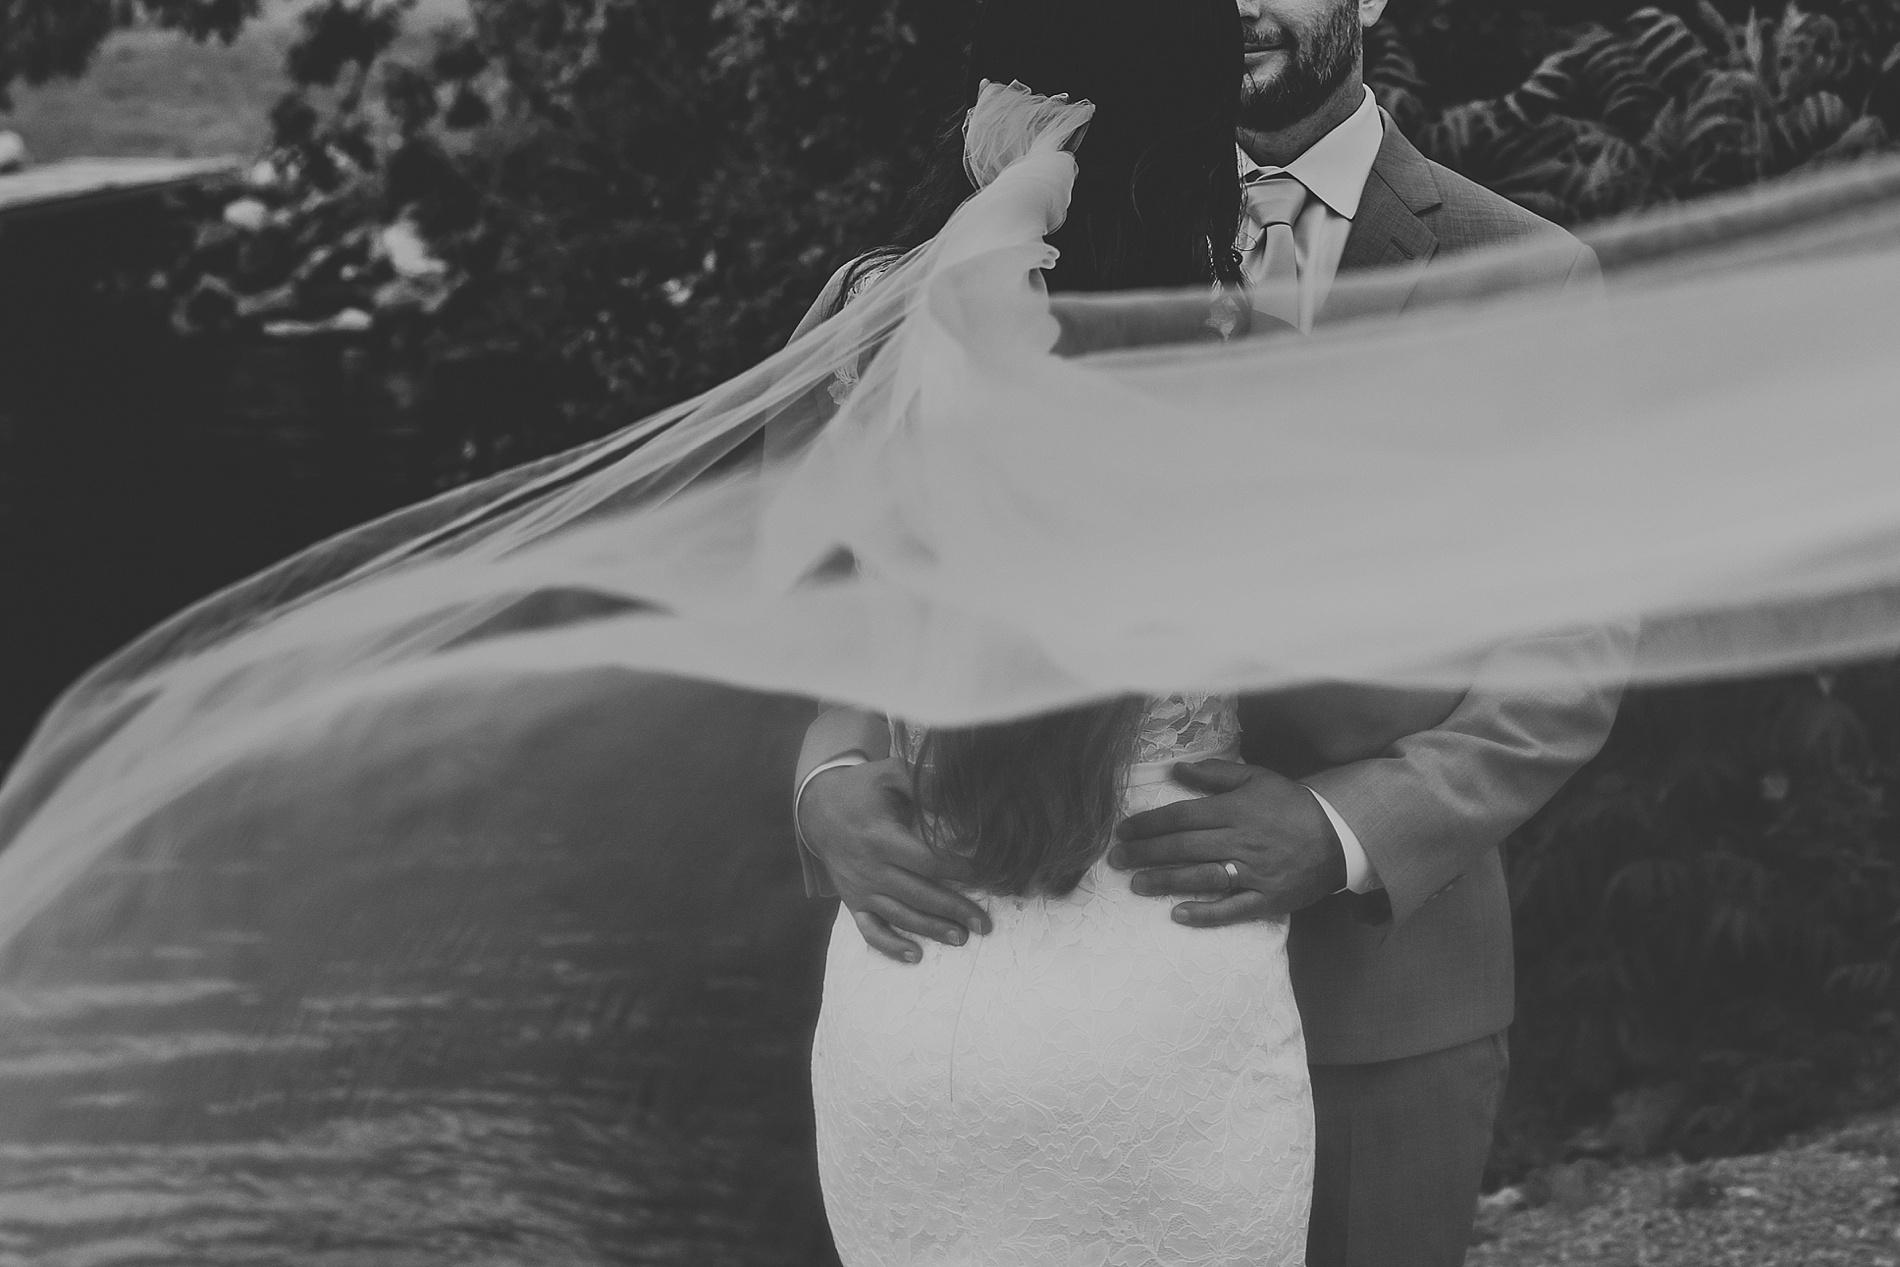 Kawartha_Lakes_Wedding_Bobcageon_Eganridge_Resort_Toronto_Photographer_0049.jpg